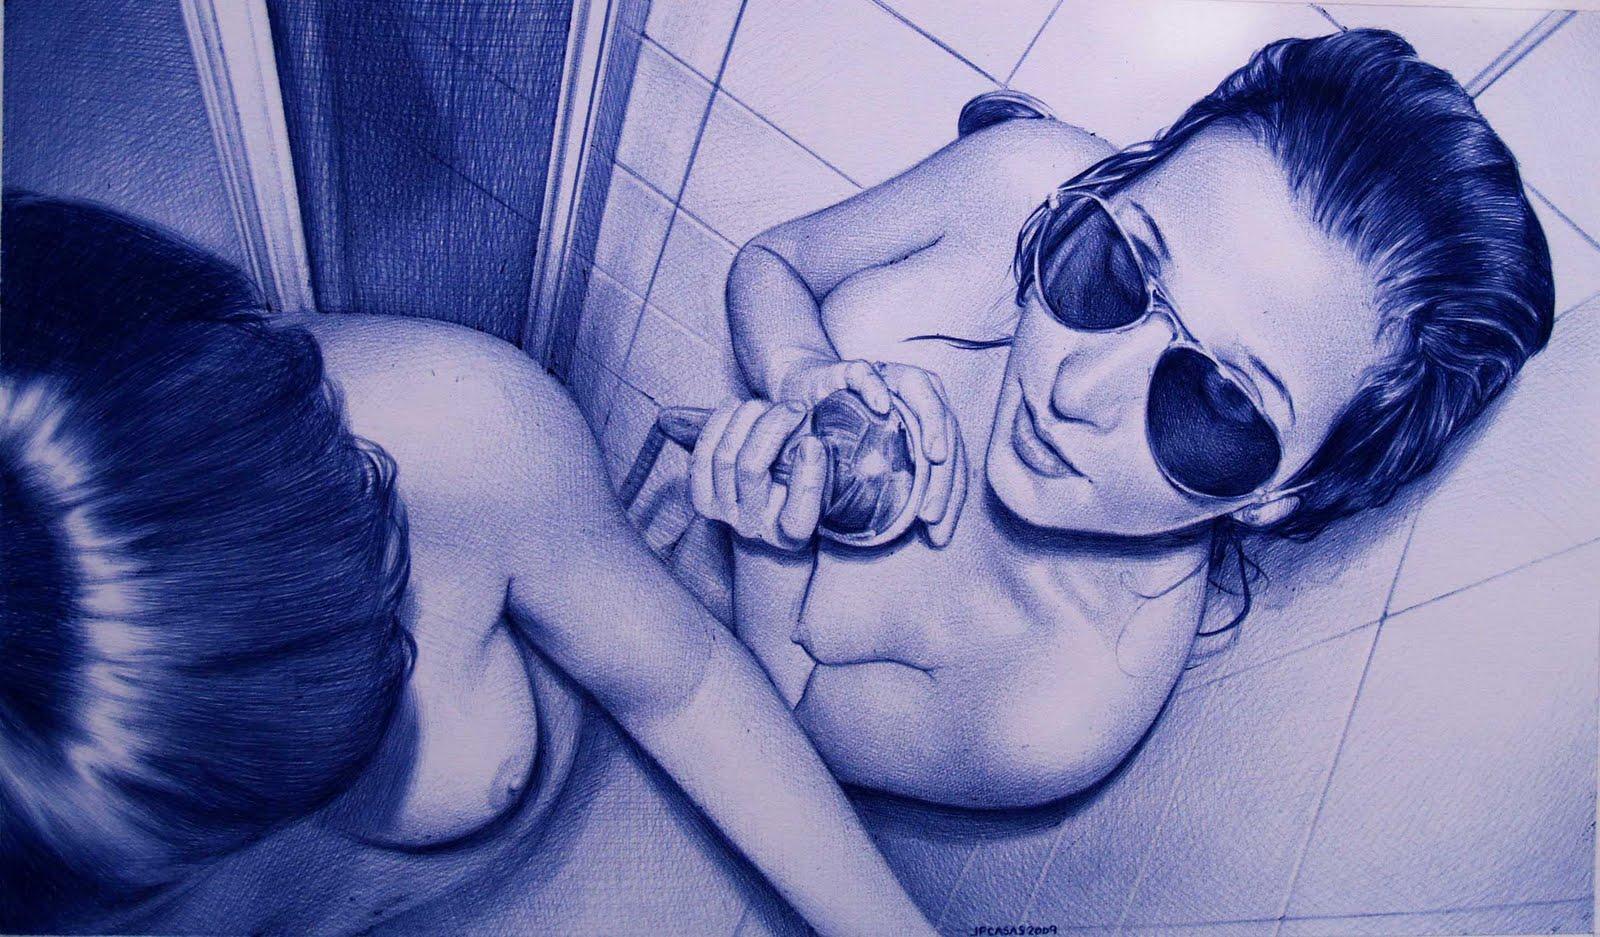 juan-francisco-cavas-realismo-caneta-esferografica-bic-oleo-sobre-tela-pintura-dionisio-arte-22.jpg